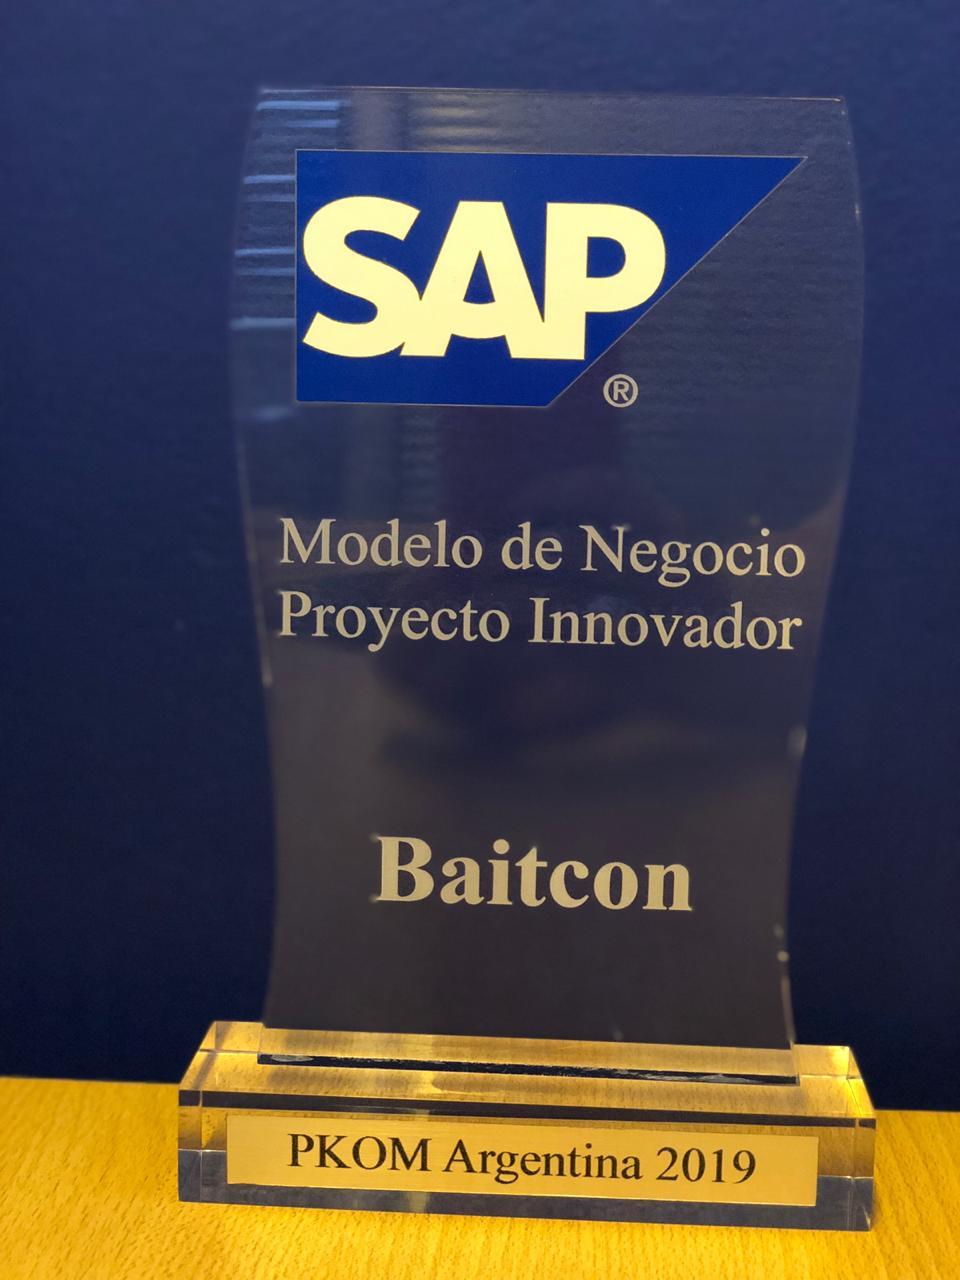 Premio Modelo de Negocio Proyecto Innovador 2019